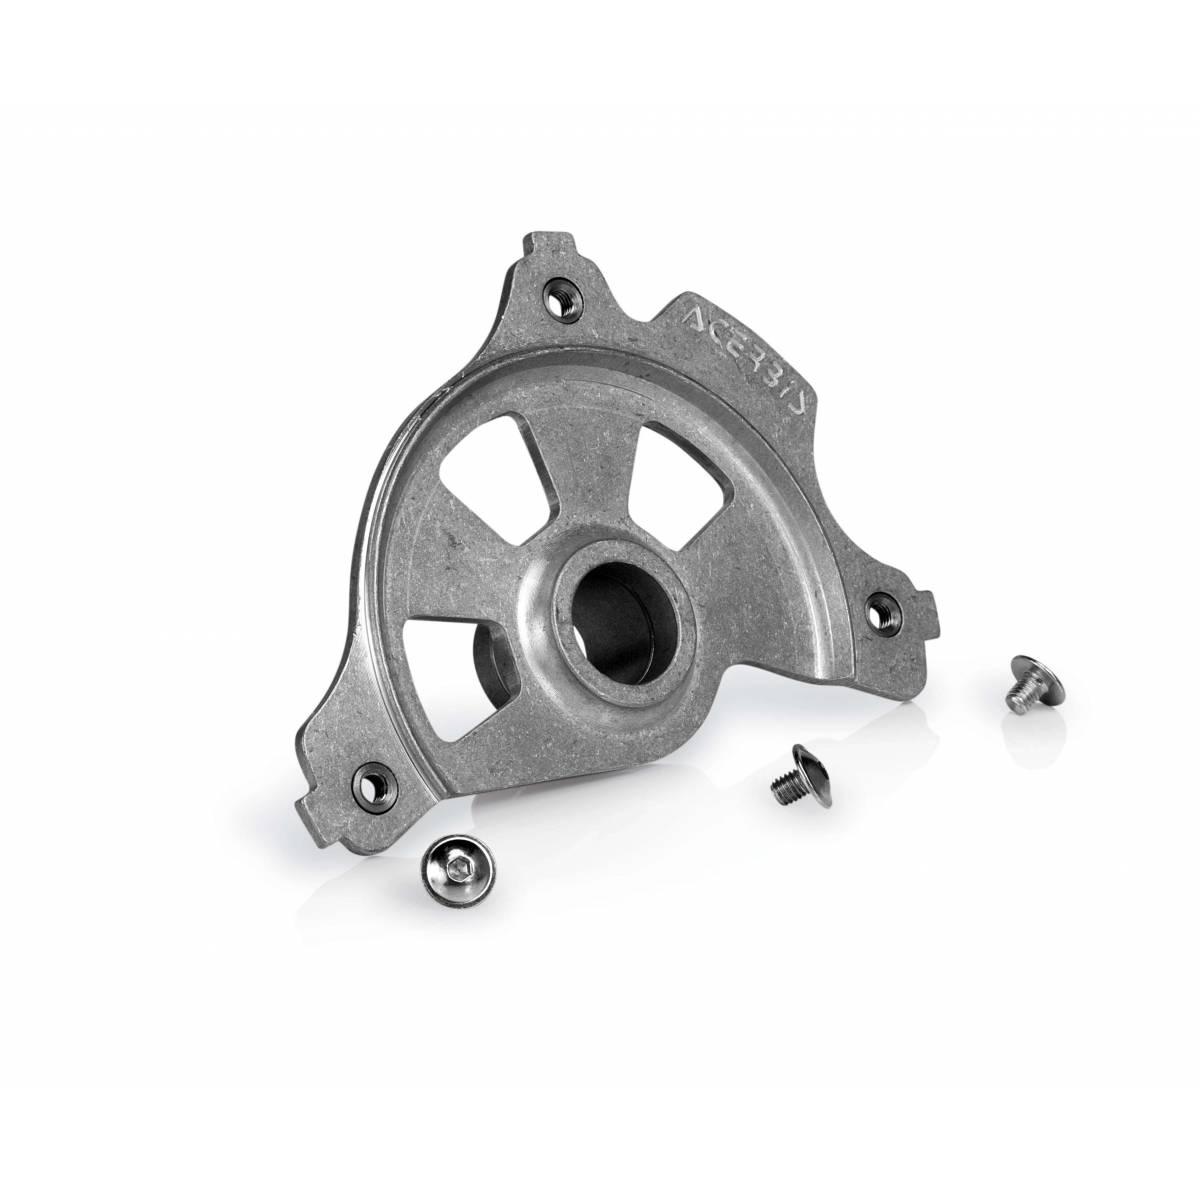 0017827 - Kit Acople Cubredisco Delantero Acerbis Ktm